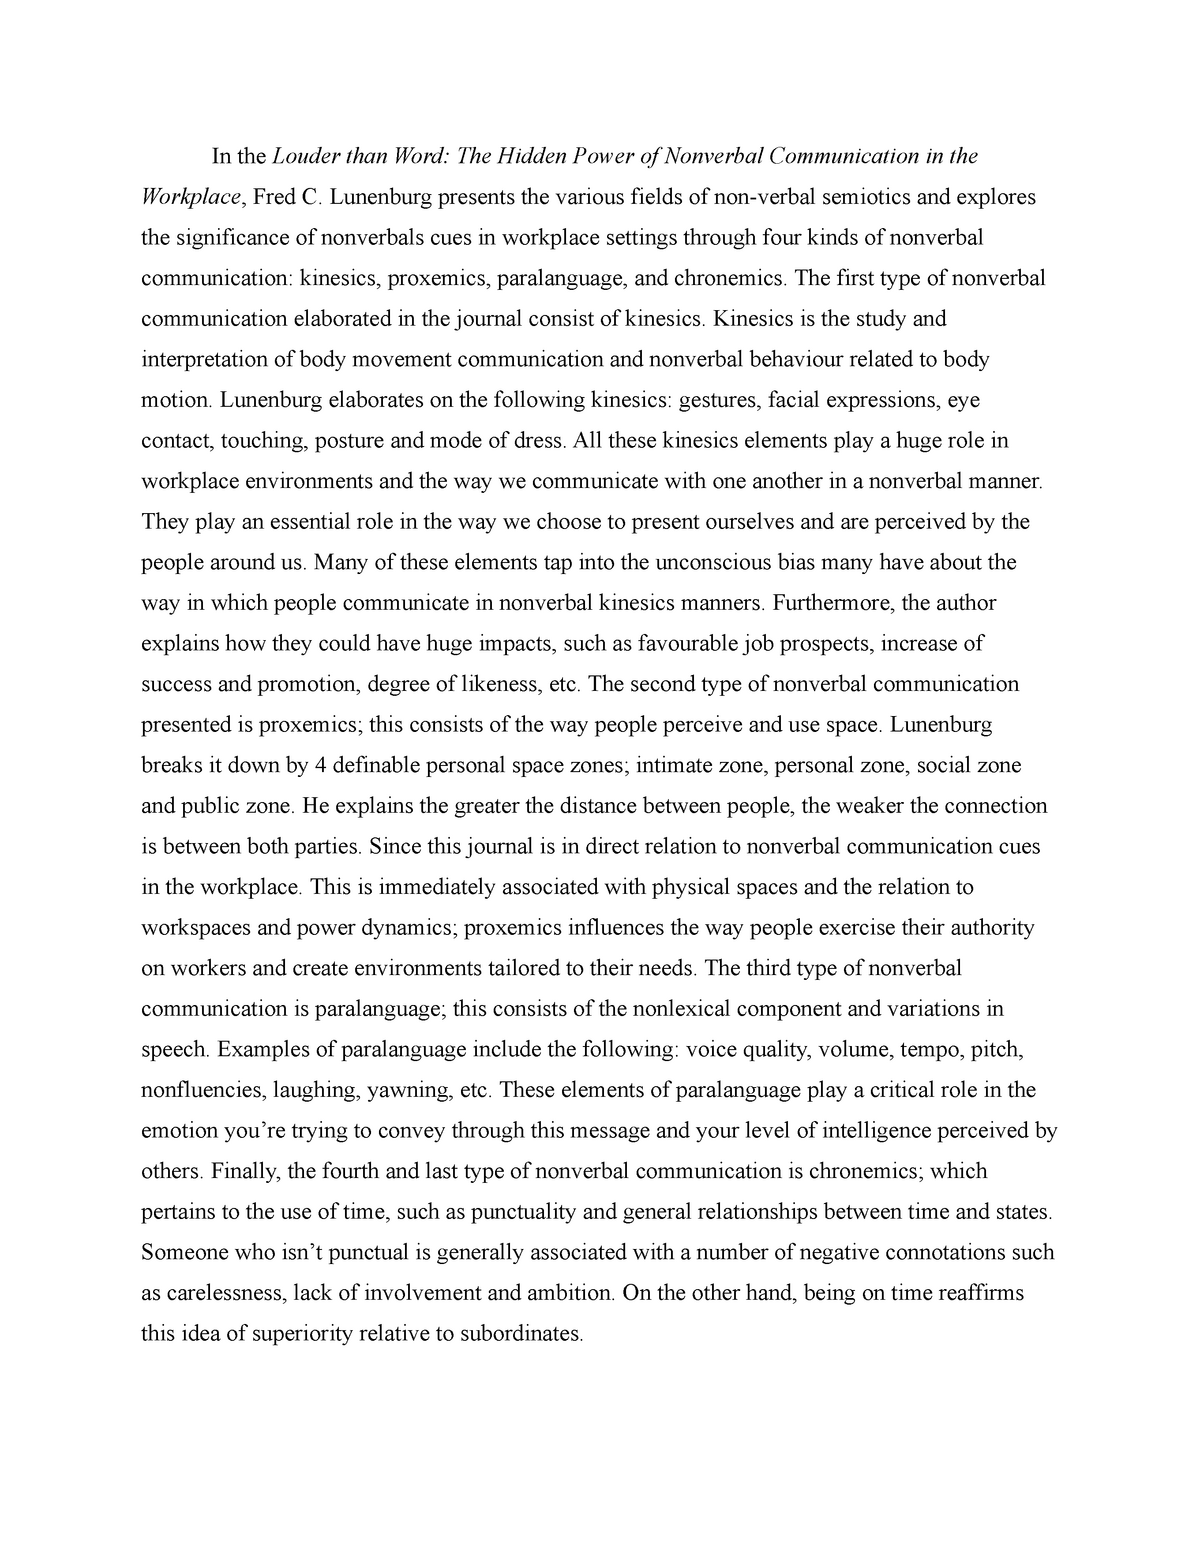 Critical Analysis Of Reading 1 Studocu It is one of several subcategories of. critical analysis of reading 1 studocu